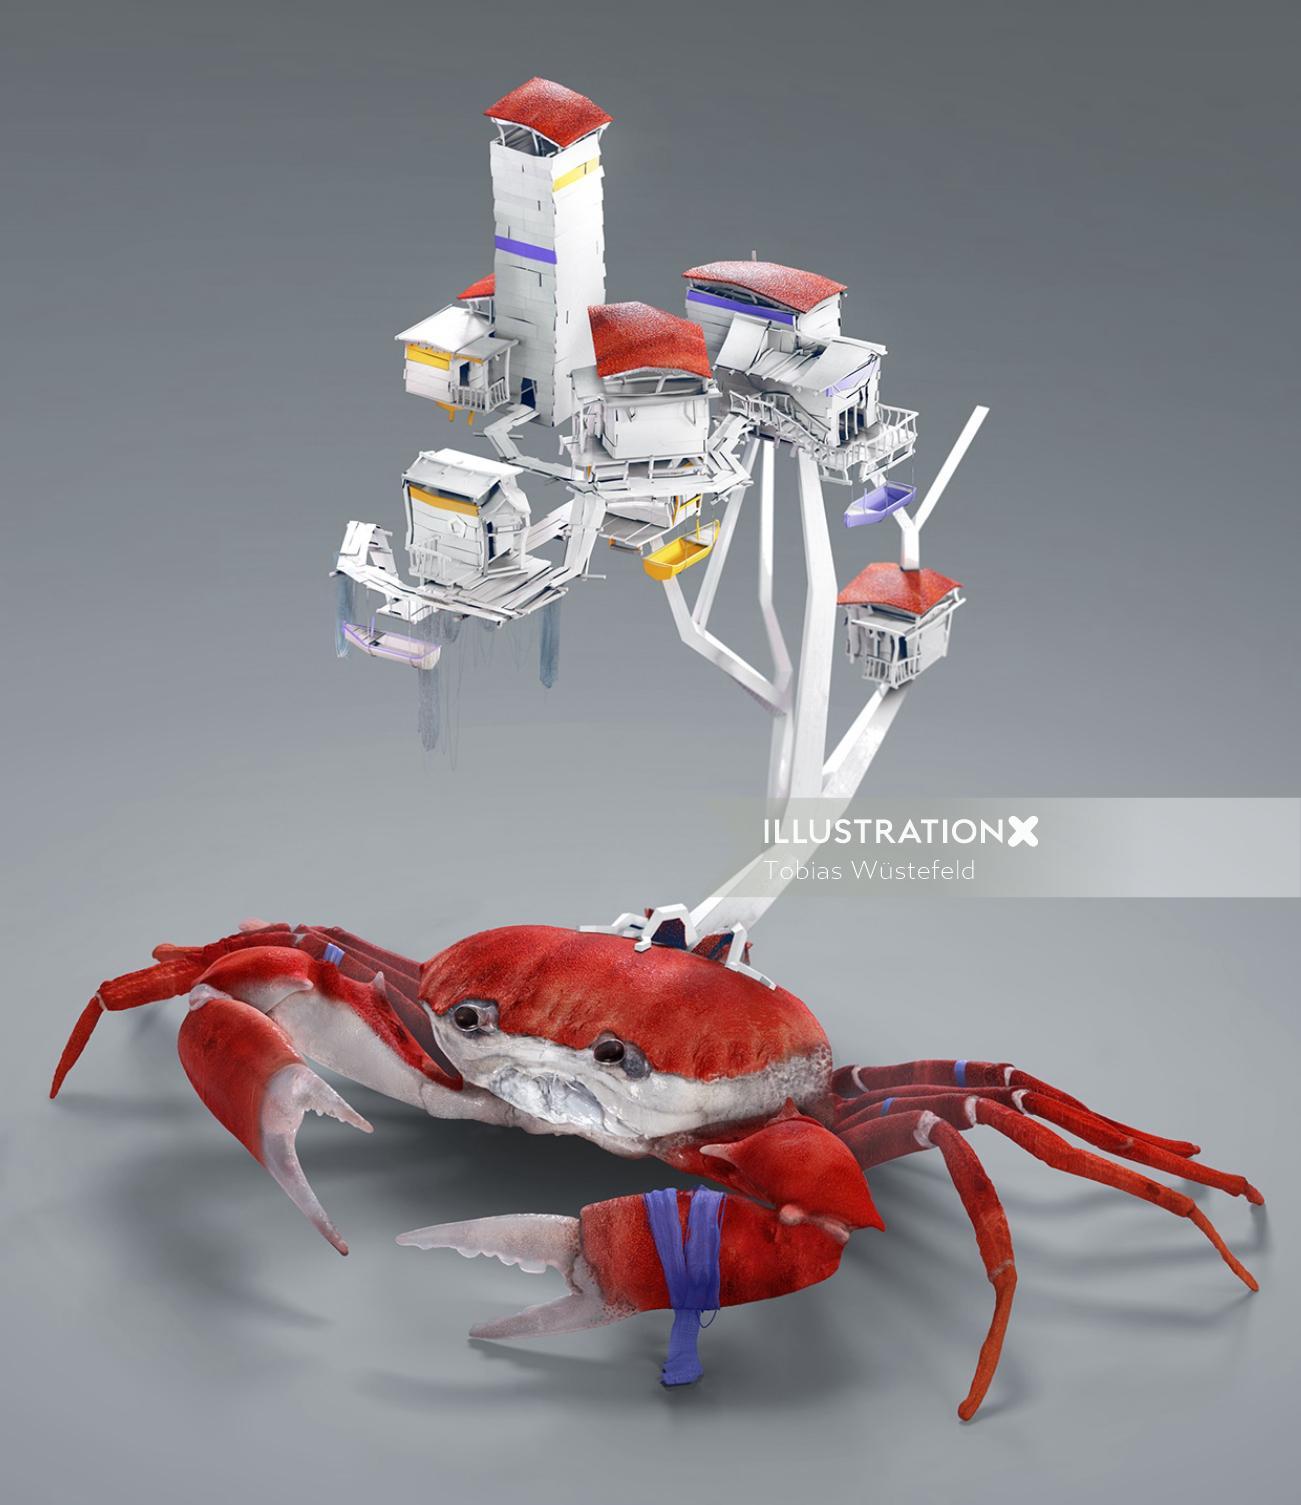 Cgi rendering illustration of crab house